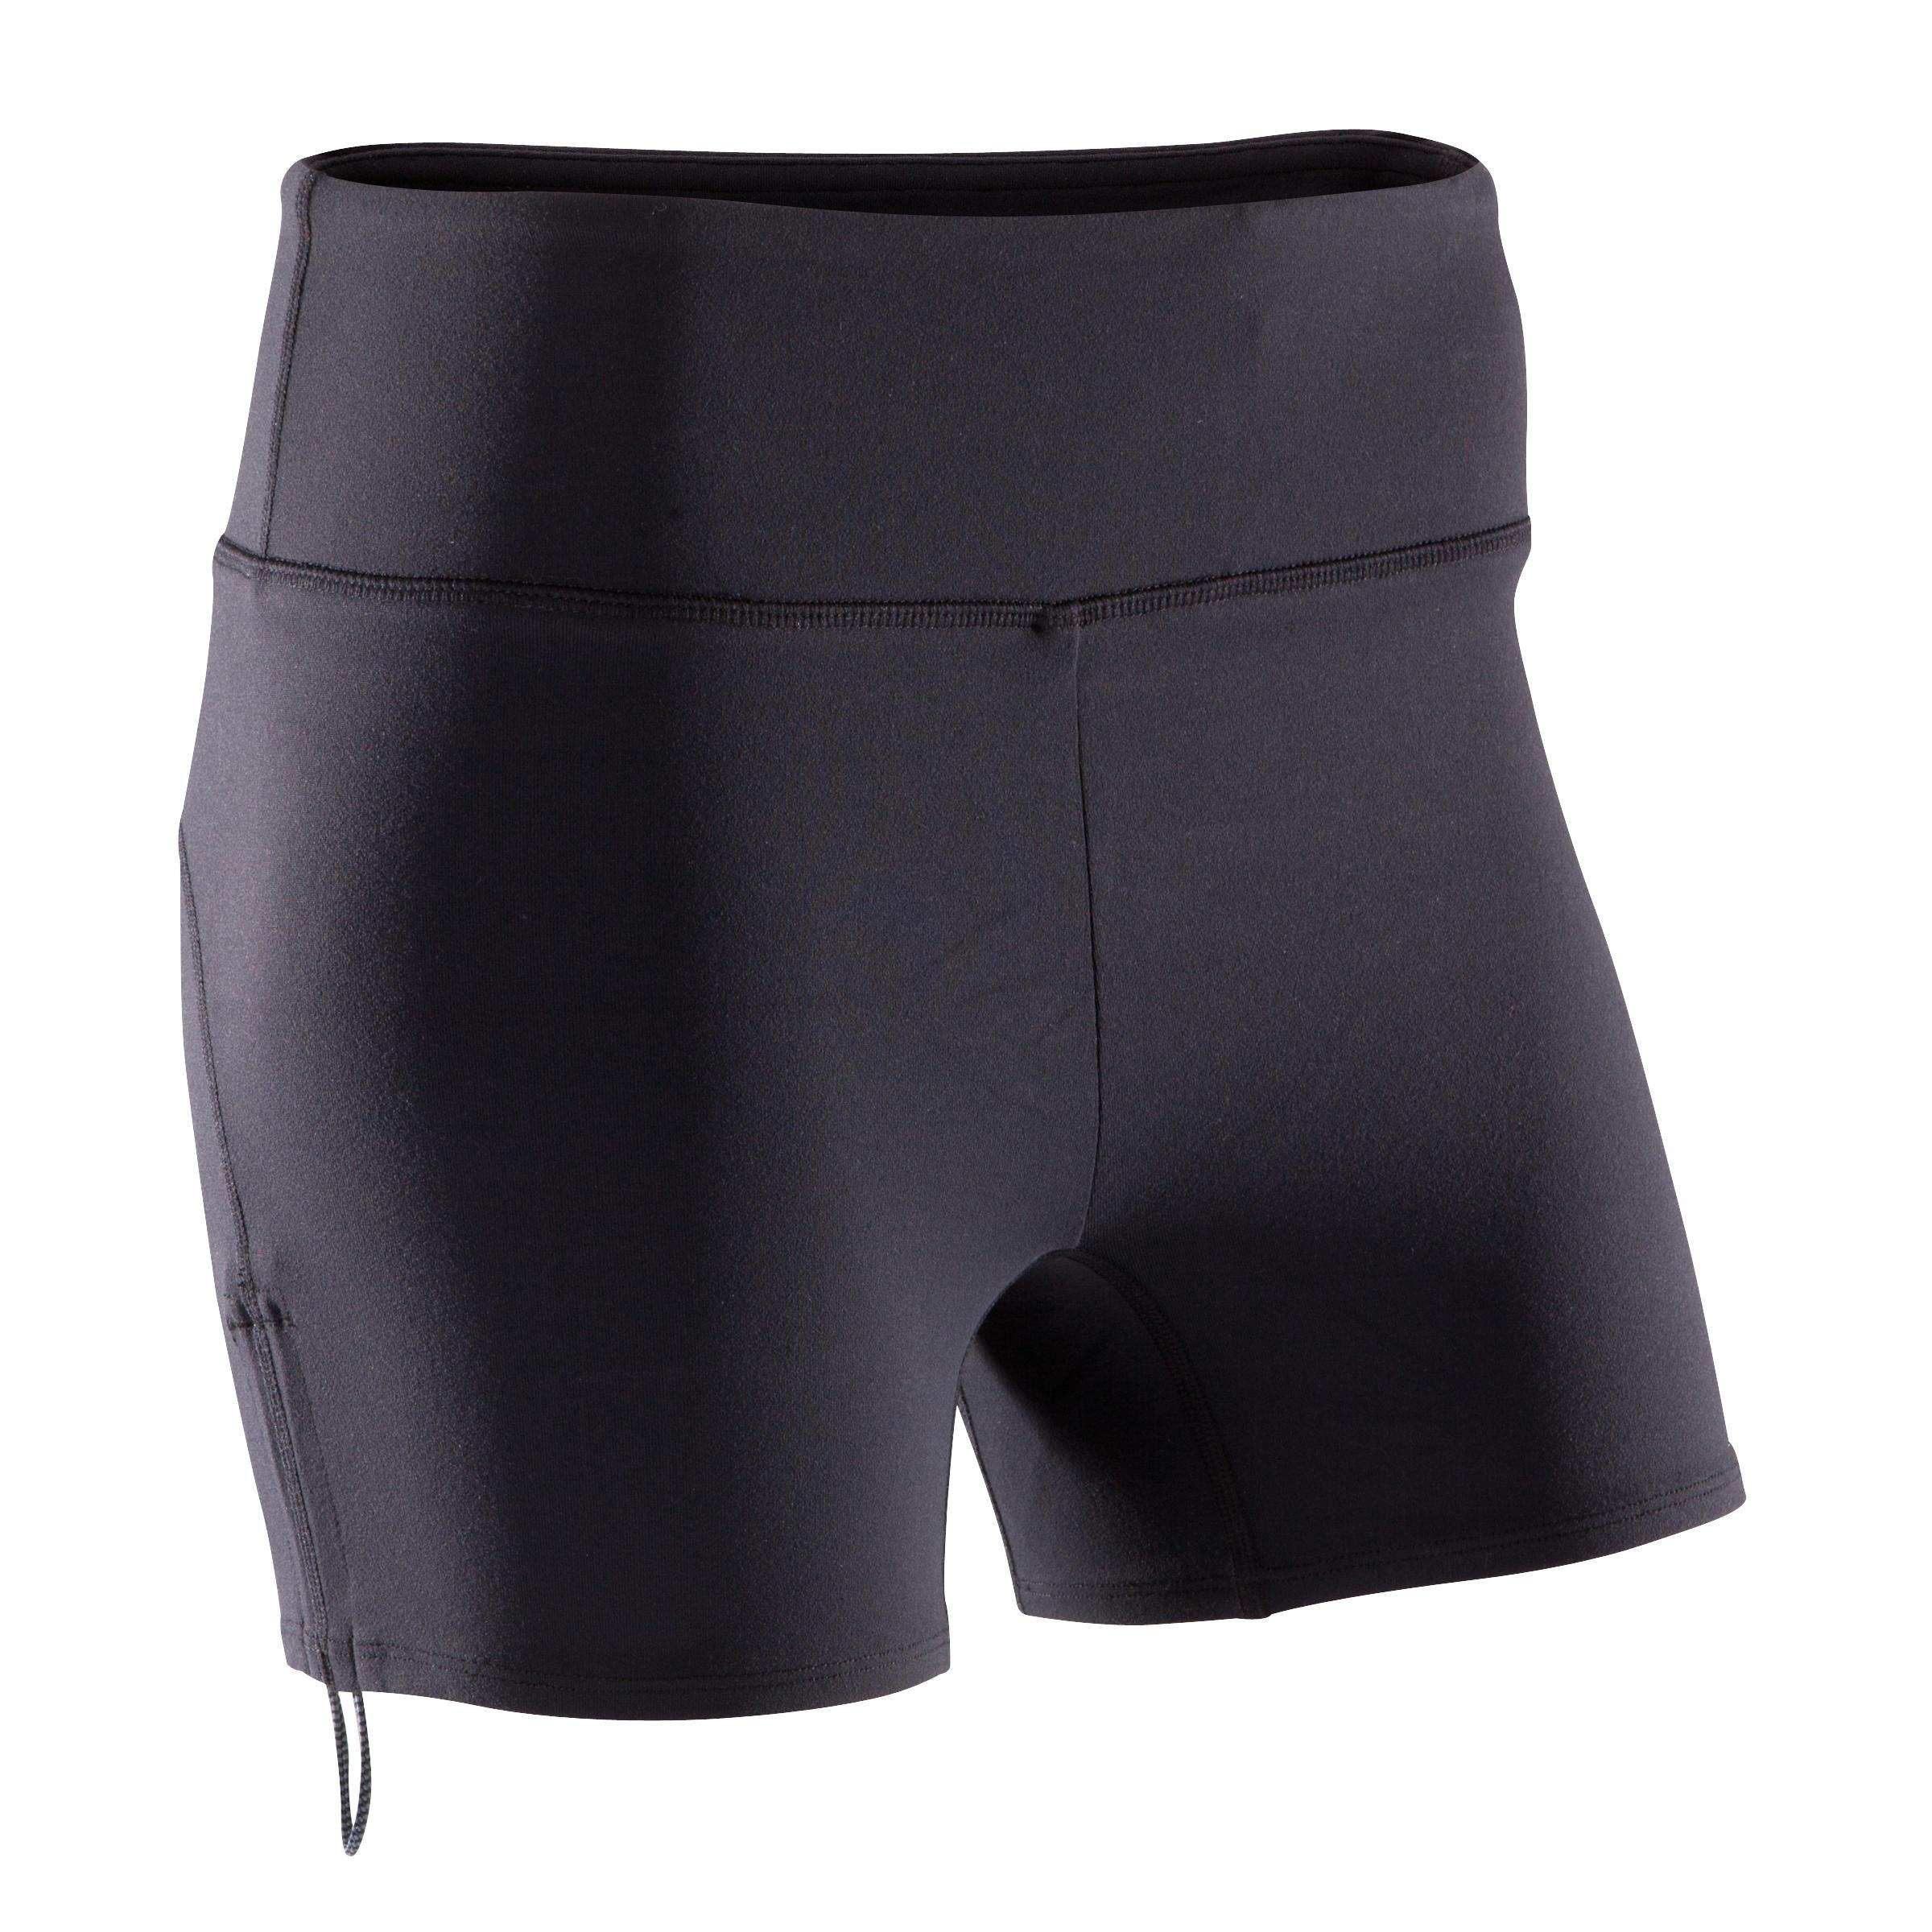 Women's Dynamic Yoga Shorts